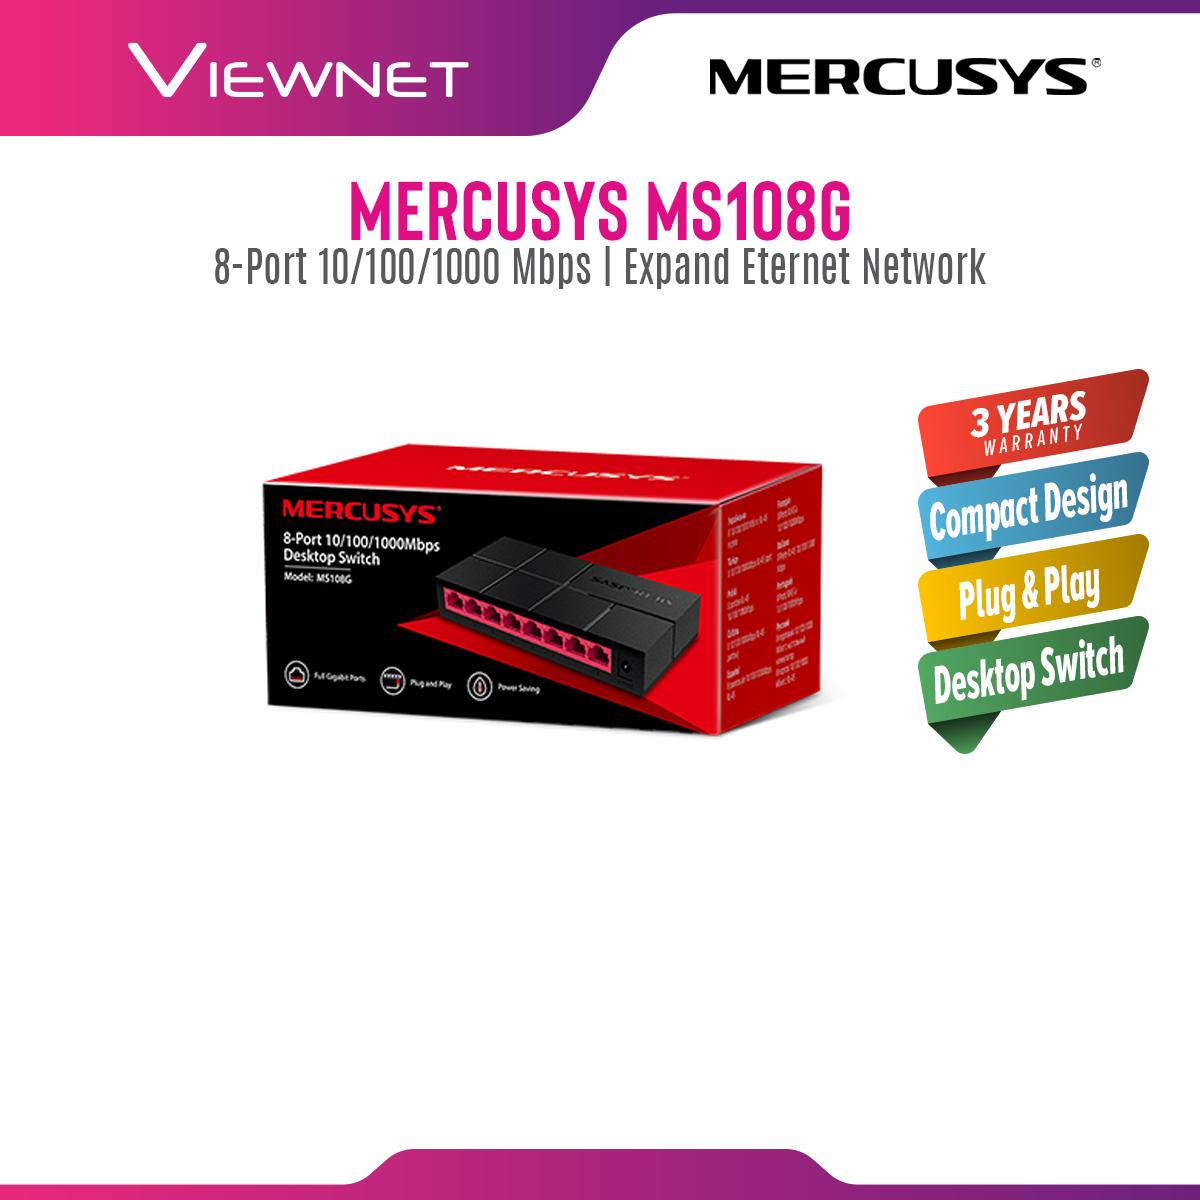 Mercusys (Powered by TP-Link) 8-Port Gigabit 10/100/1000 Mbps Desktop Network Ethernet LAN Switch MS108G (TP LINK)